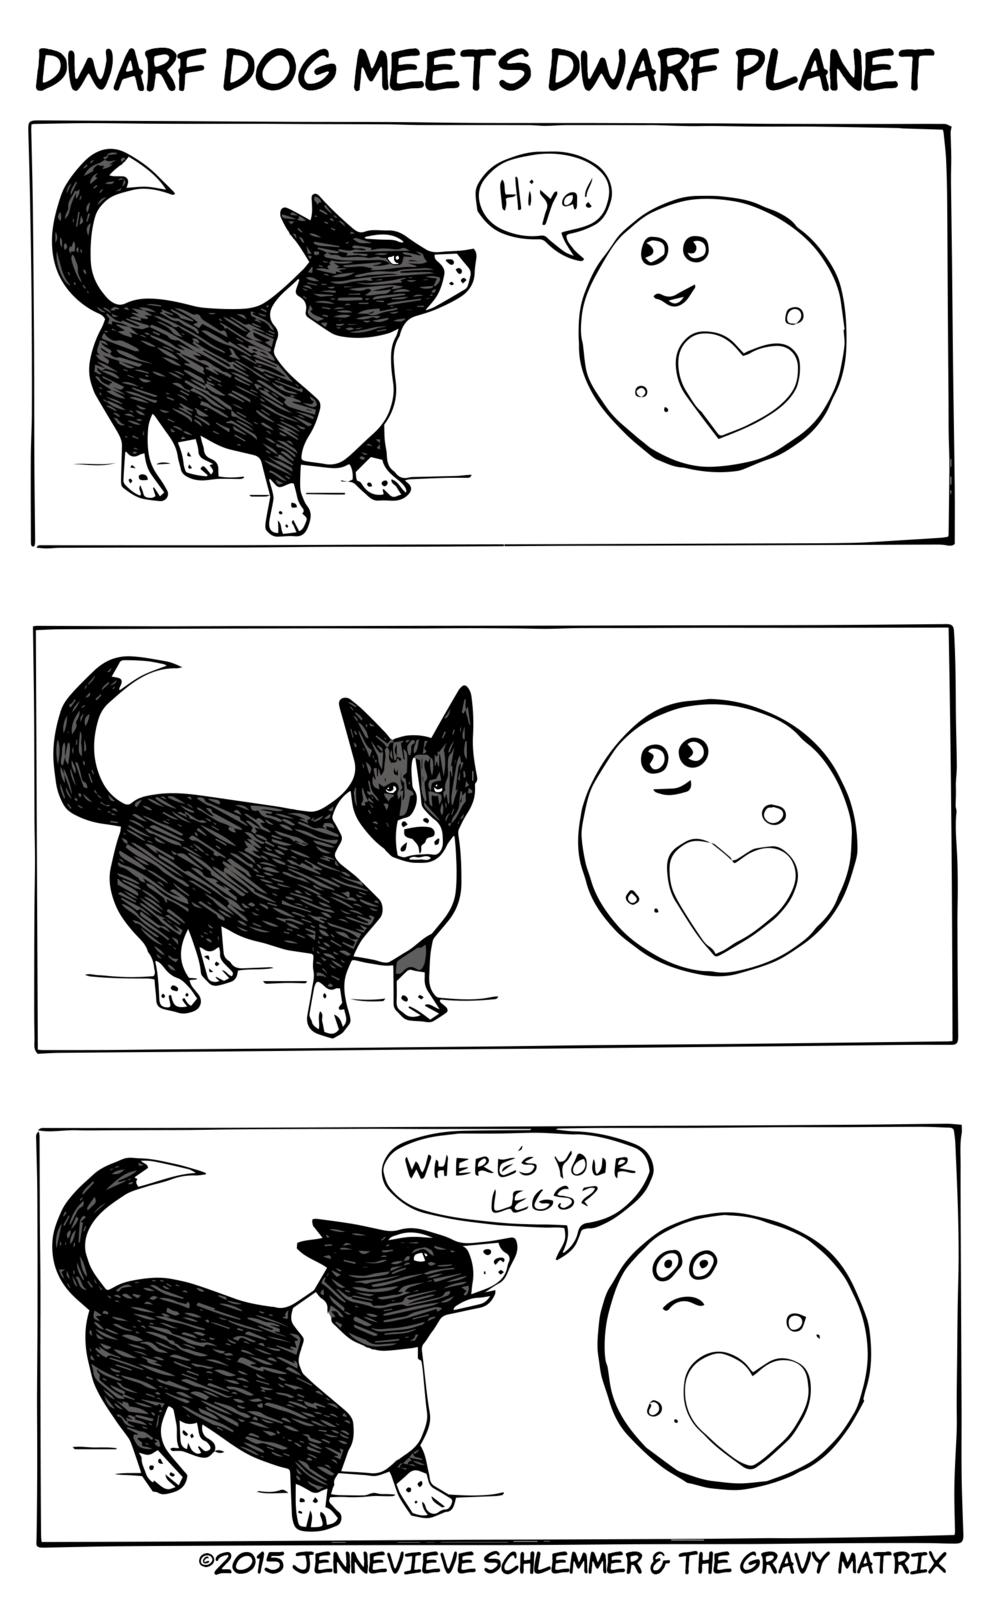 dwarf dog meets dwarf planet.png